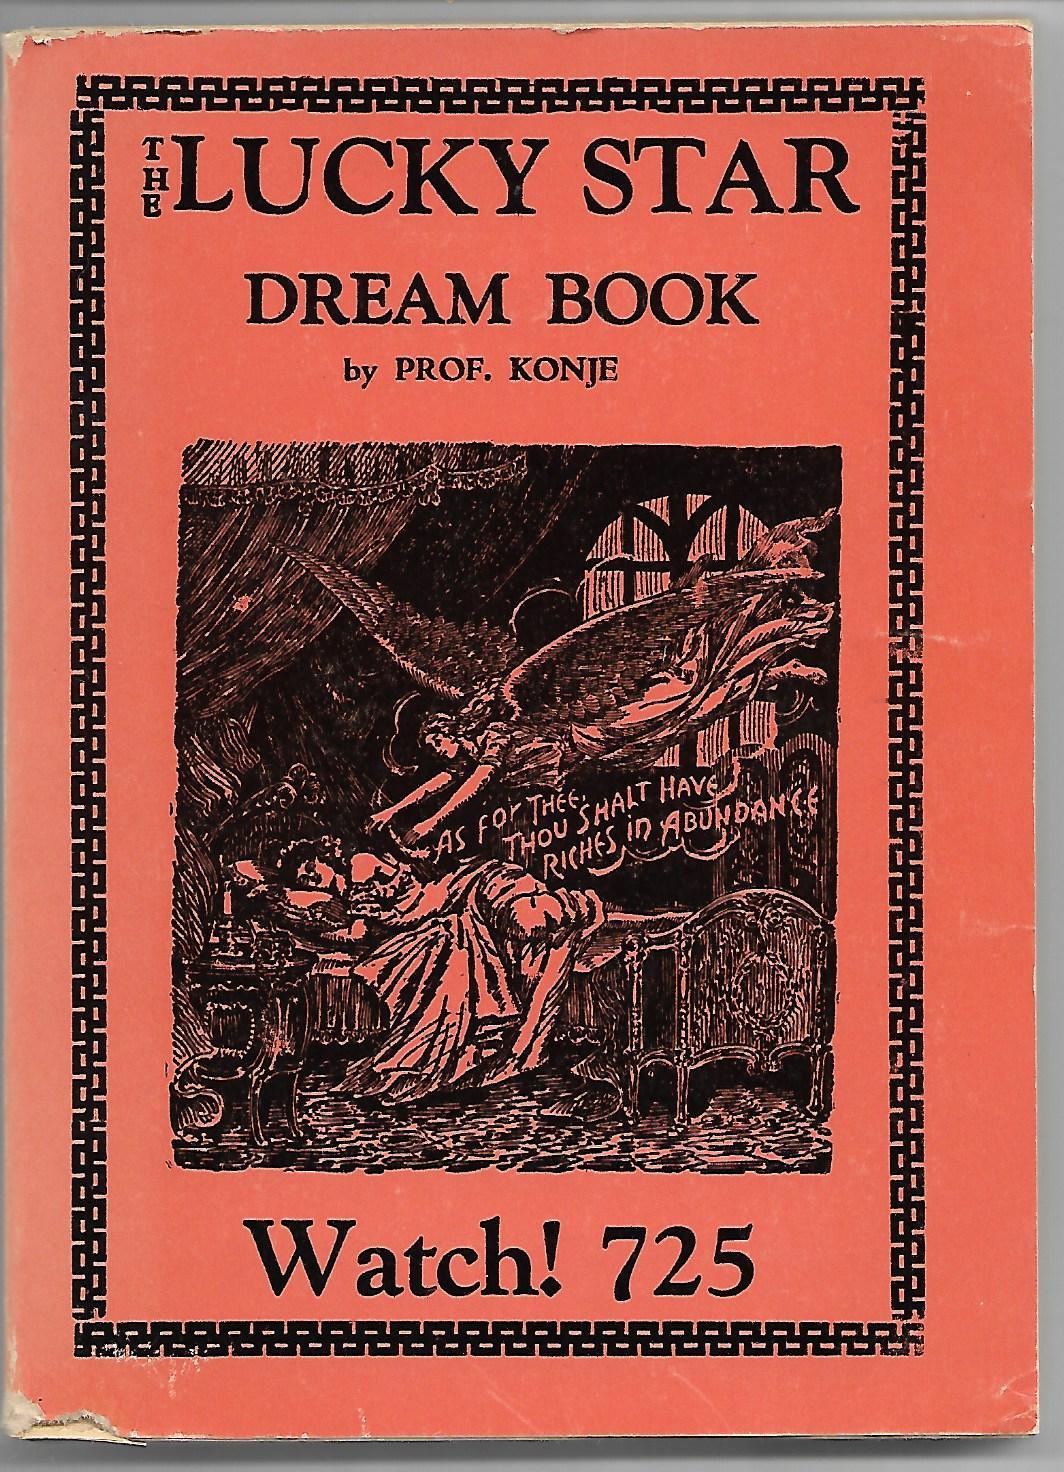 The Lucky Star Dream Book